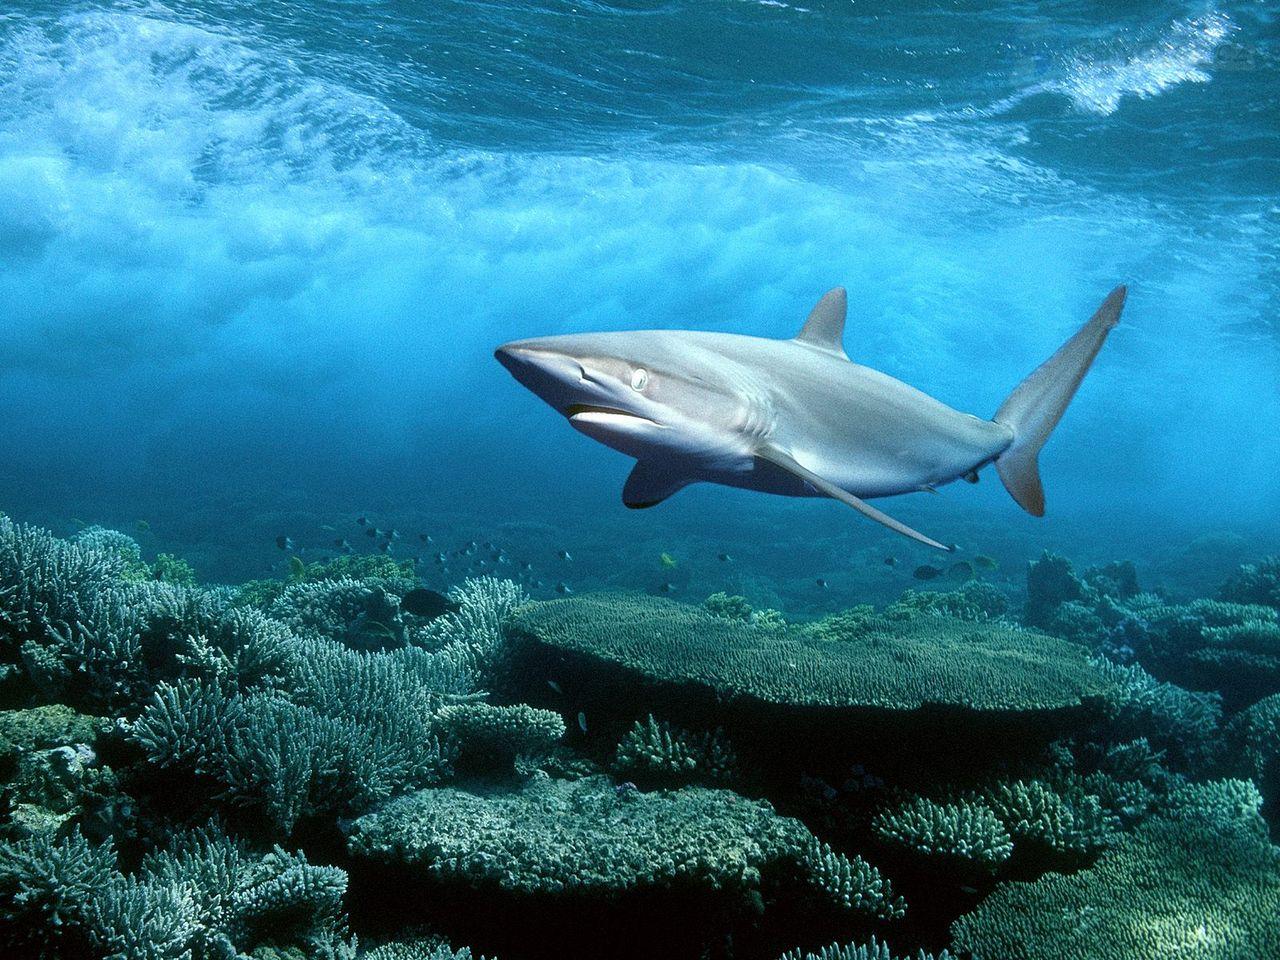 Http//www.topglobus.ru/krasne-fotky/staty/42/silky-shark--red-sea